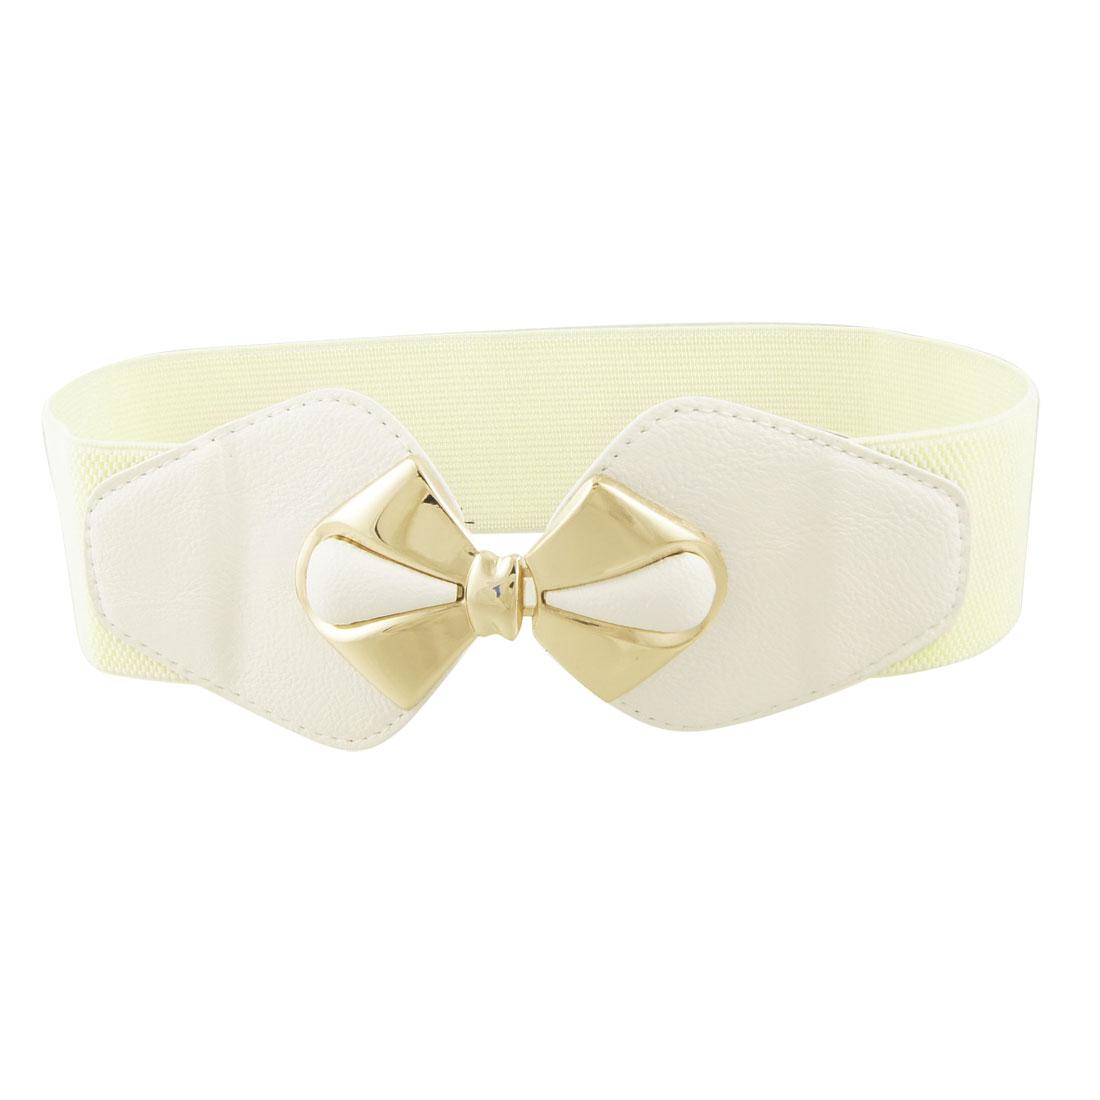 Woman Gold Tone Bowknot Buckle Wide Elastic Beige Cinch Belt